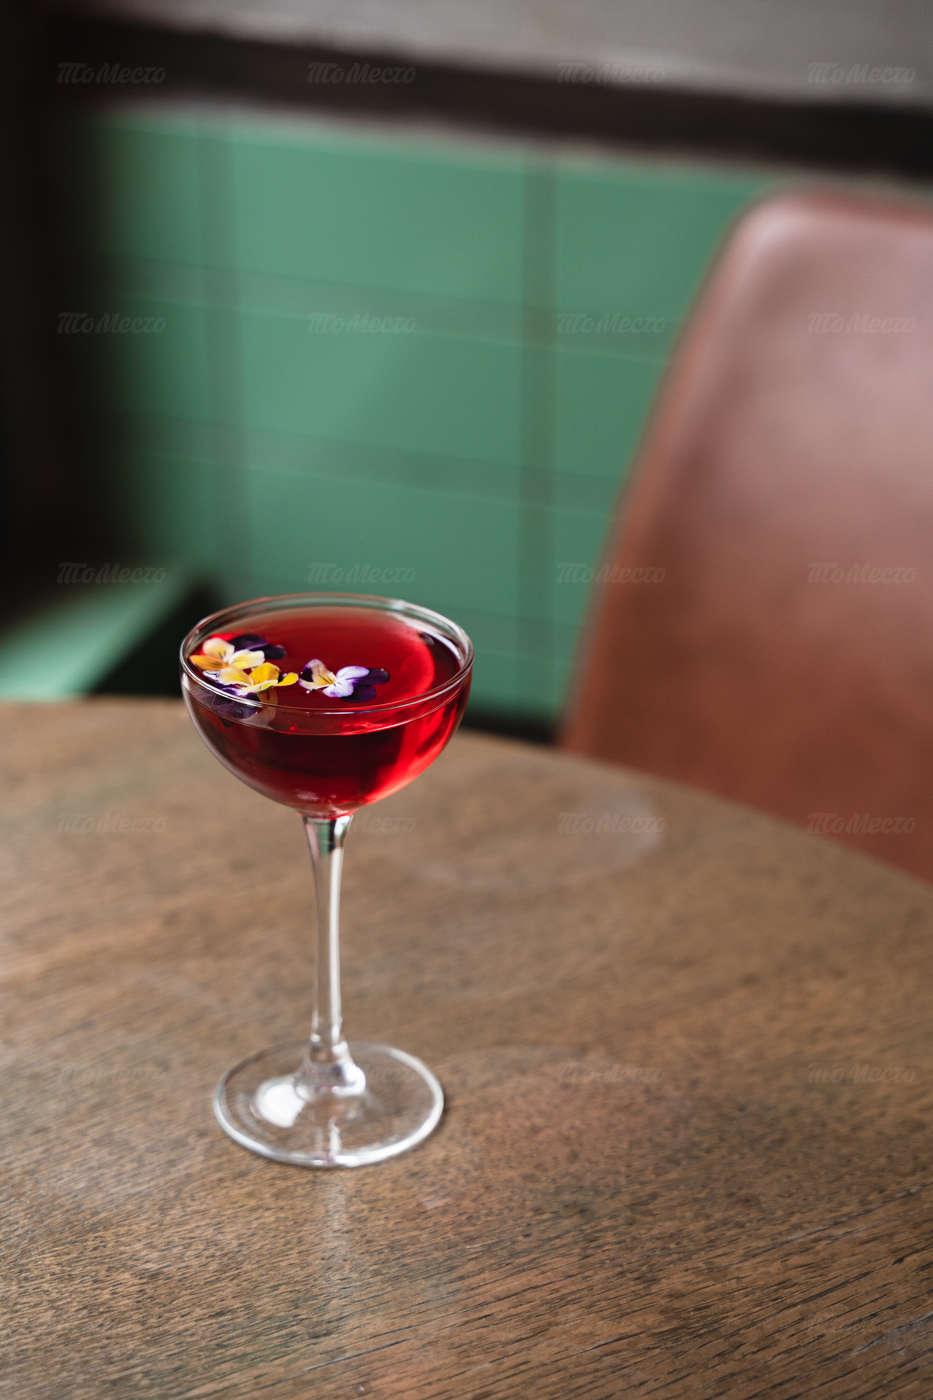 Меню ресторана Masters & Margaritas на Пятницкой улице фото 32